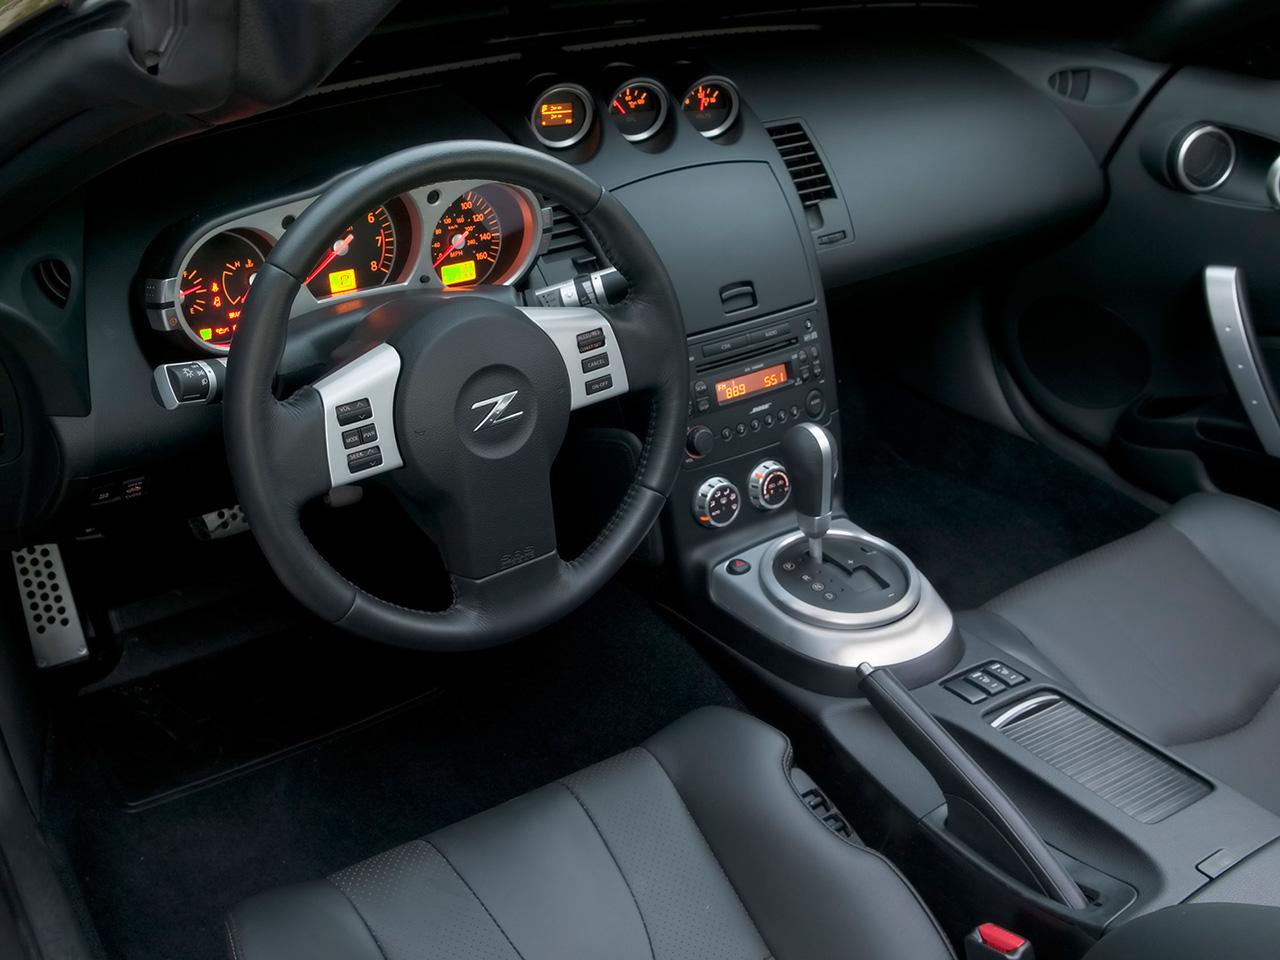 2007-Nissan-350Z-Dashboard-1280x960.jpg